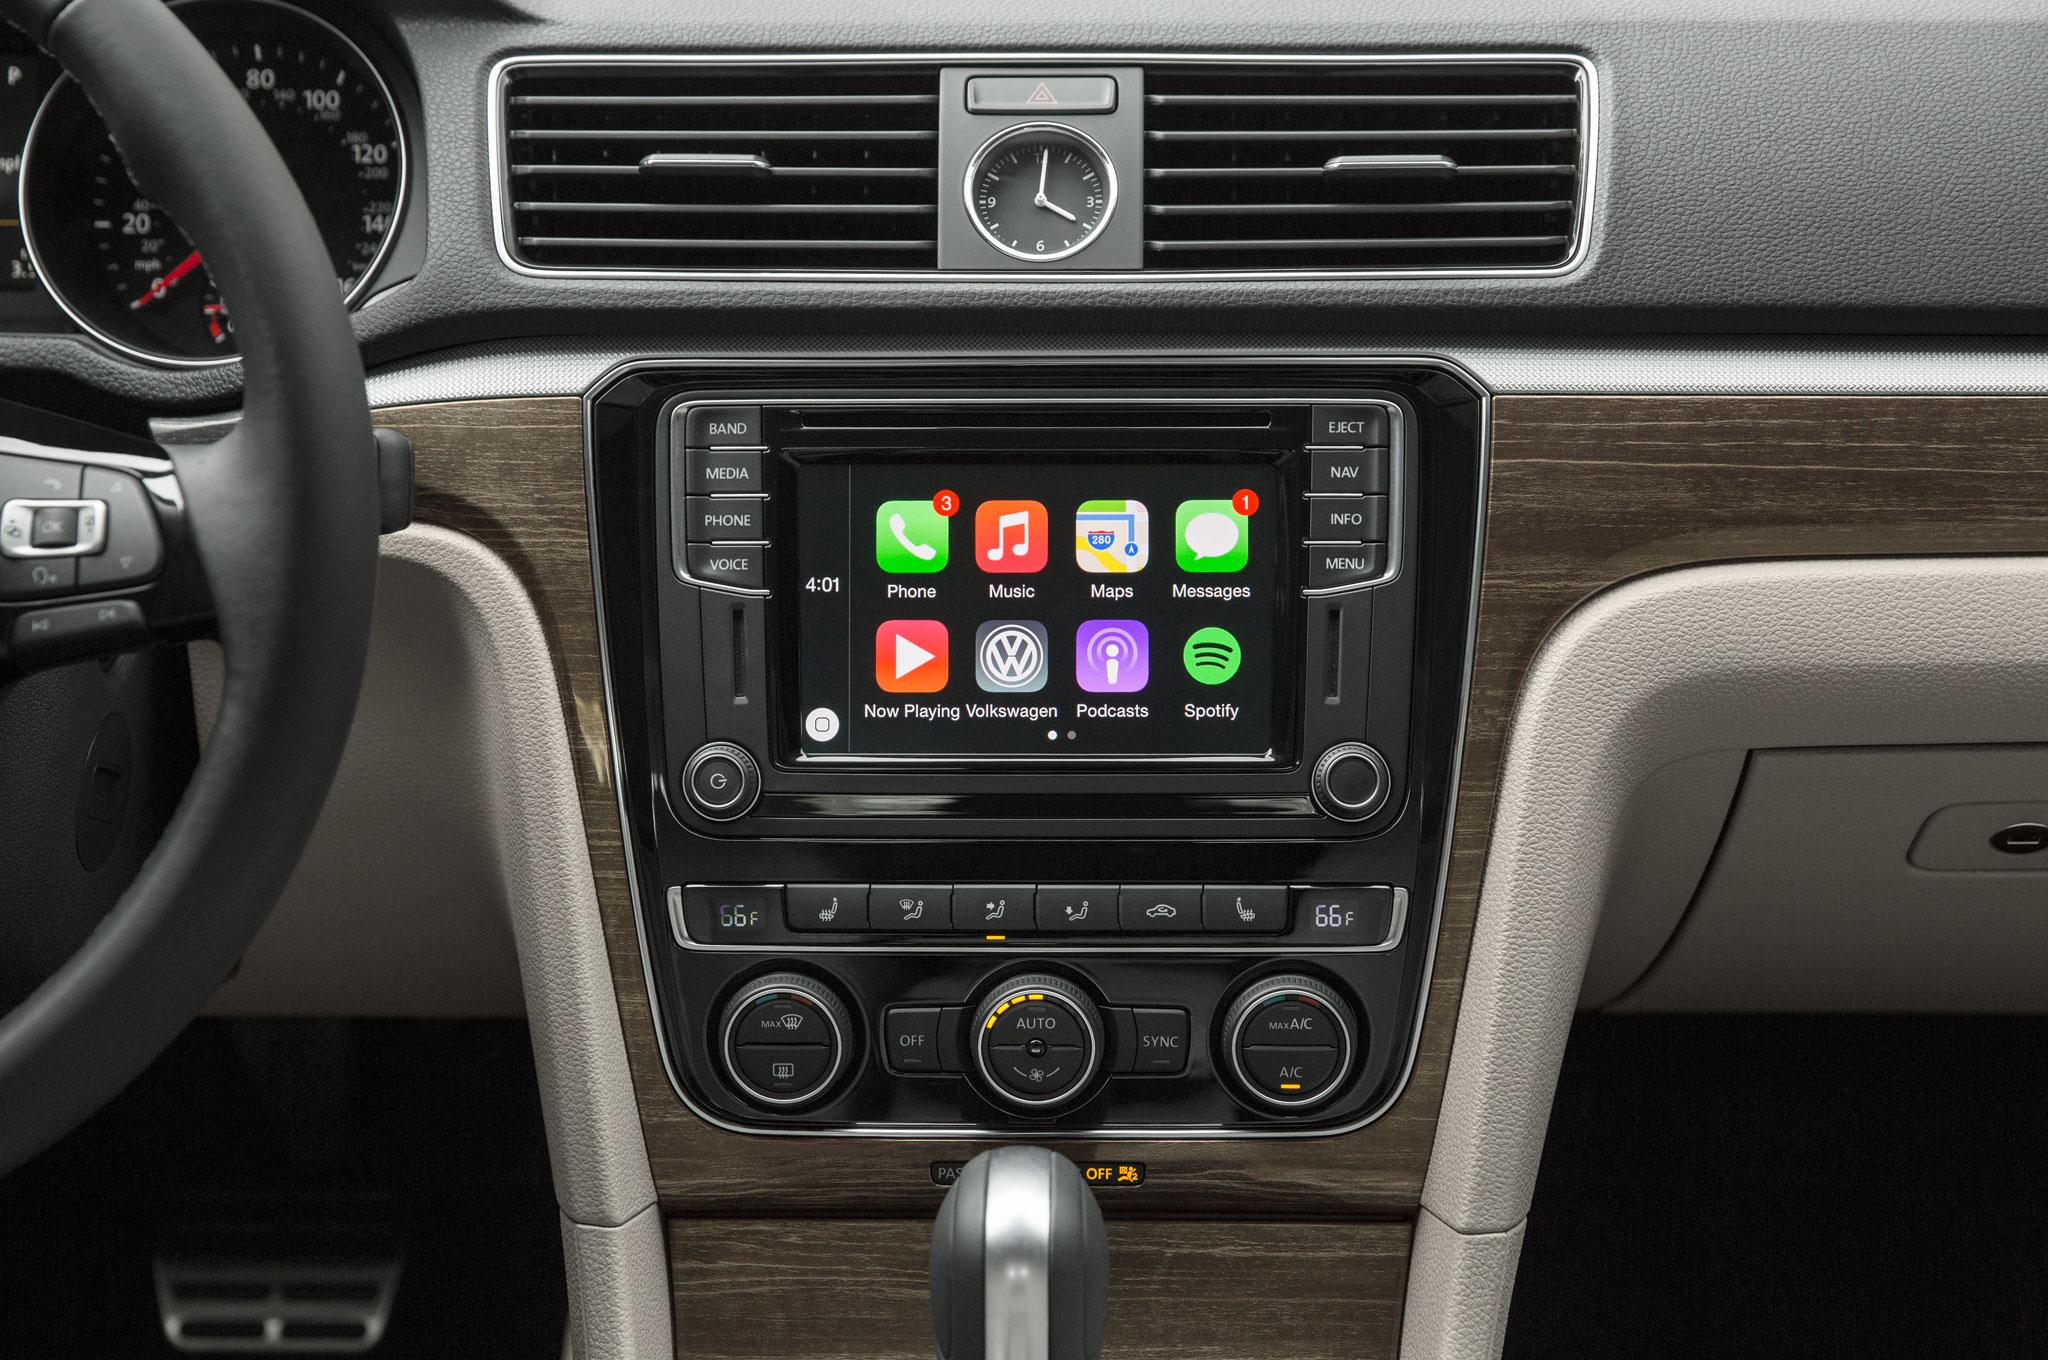 volkswagen passat gt concept to debut at 2016 los angeles auto show automobile magazine. Black Bedroom Furniture Sets. Home Design Ideas